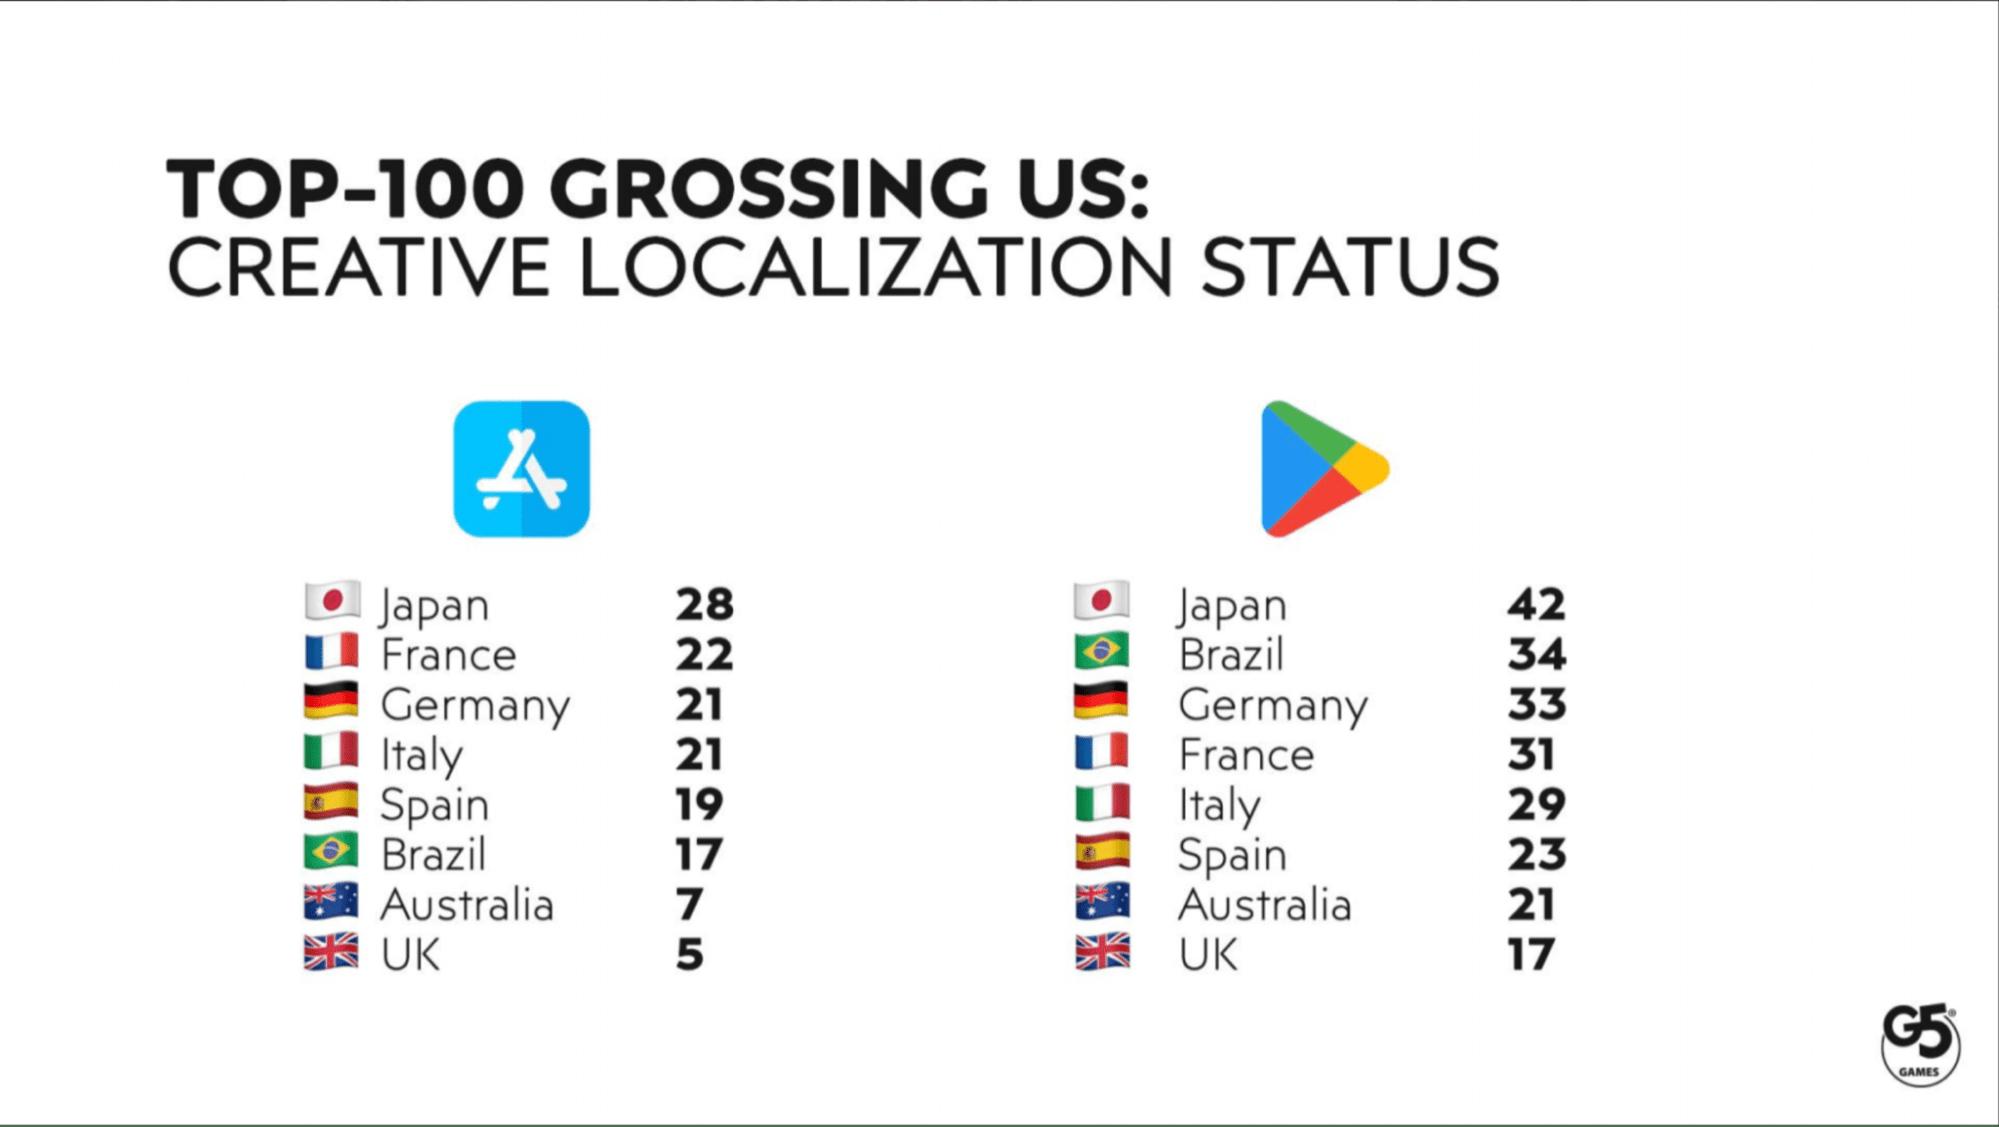 Top-100 grossing US: creative localization status